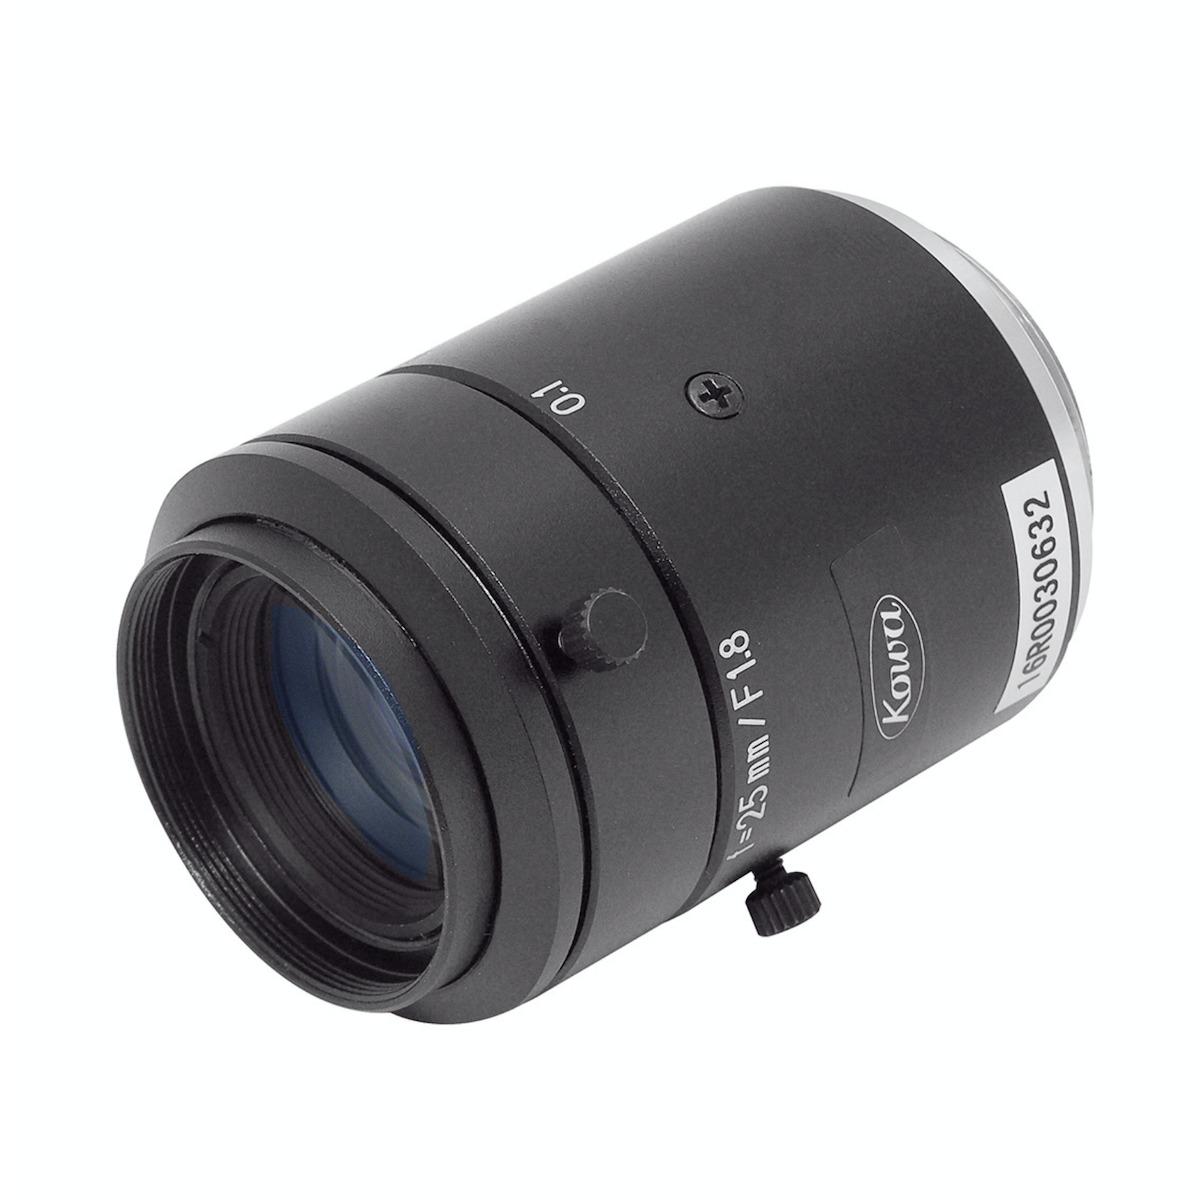 Kowa LM25JC10M lens 3/4 view